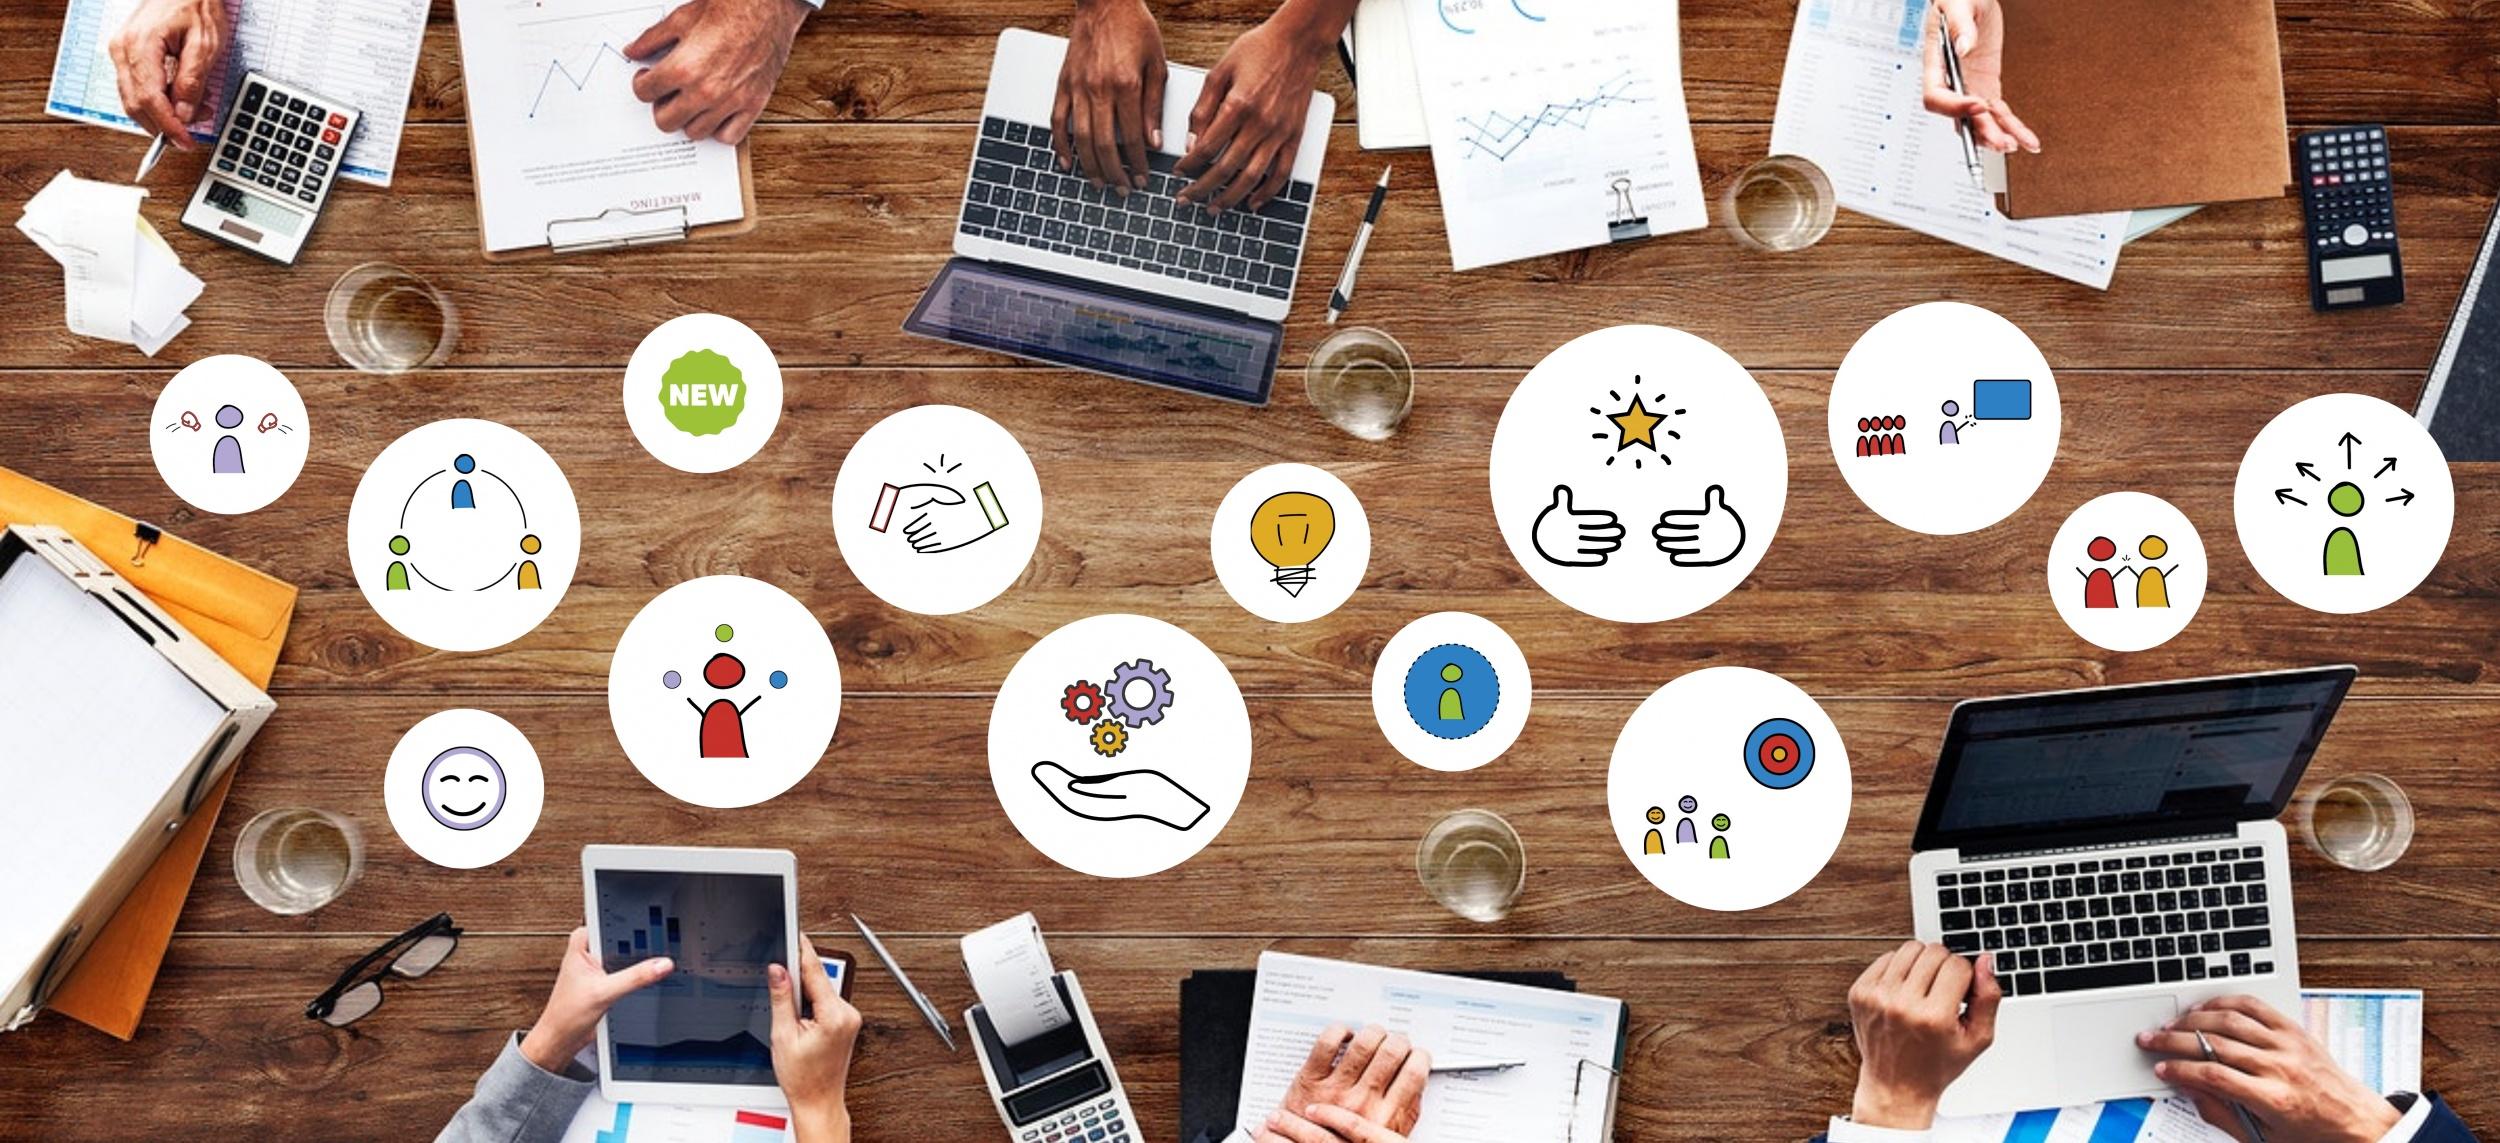 mikro teklif yönetimi yaratc drama sertifikas alanlar